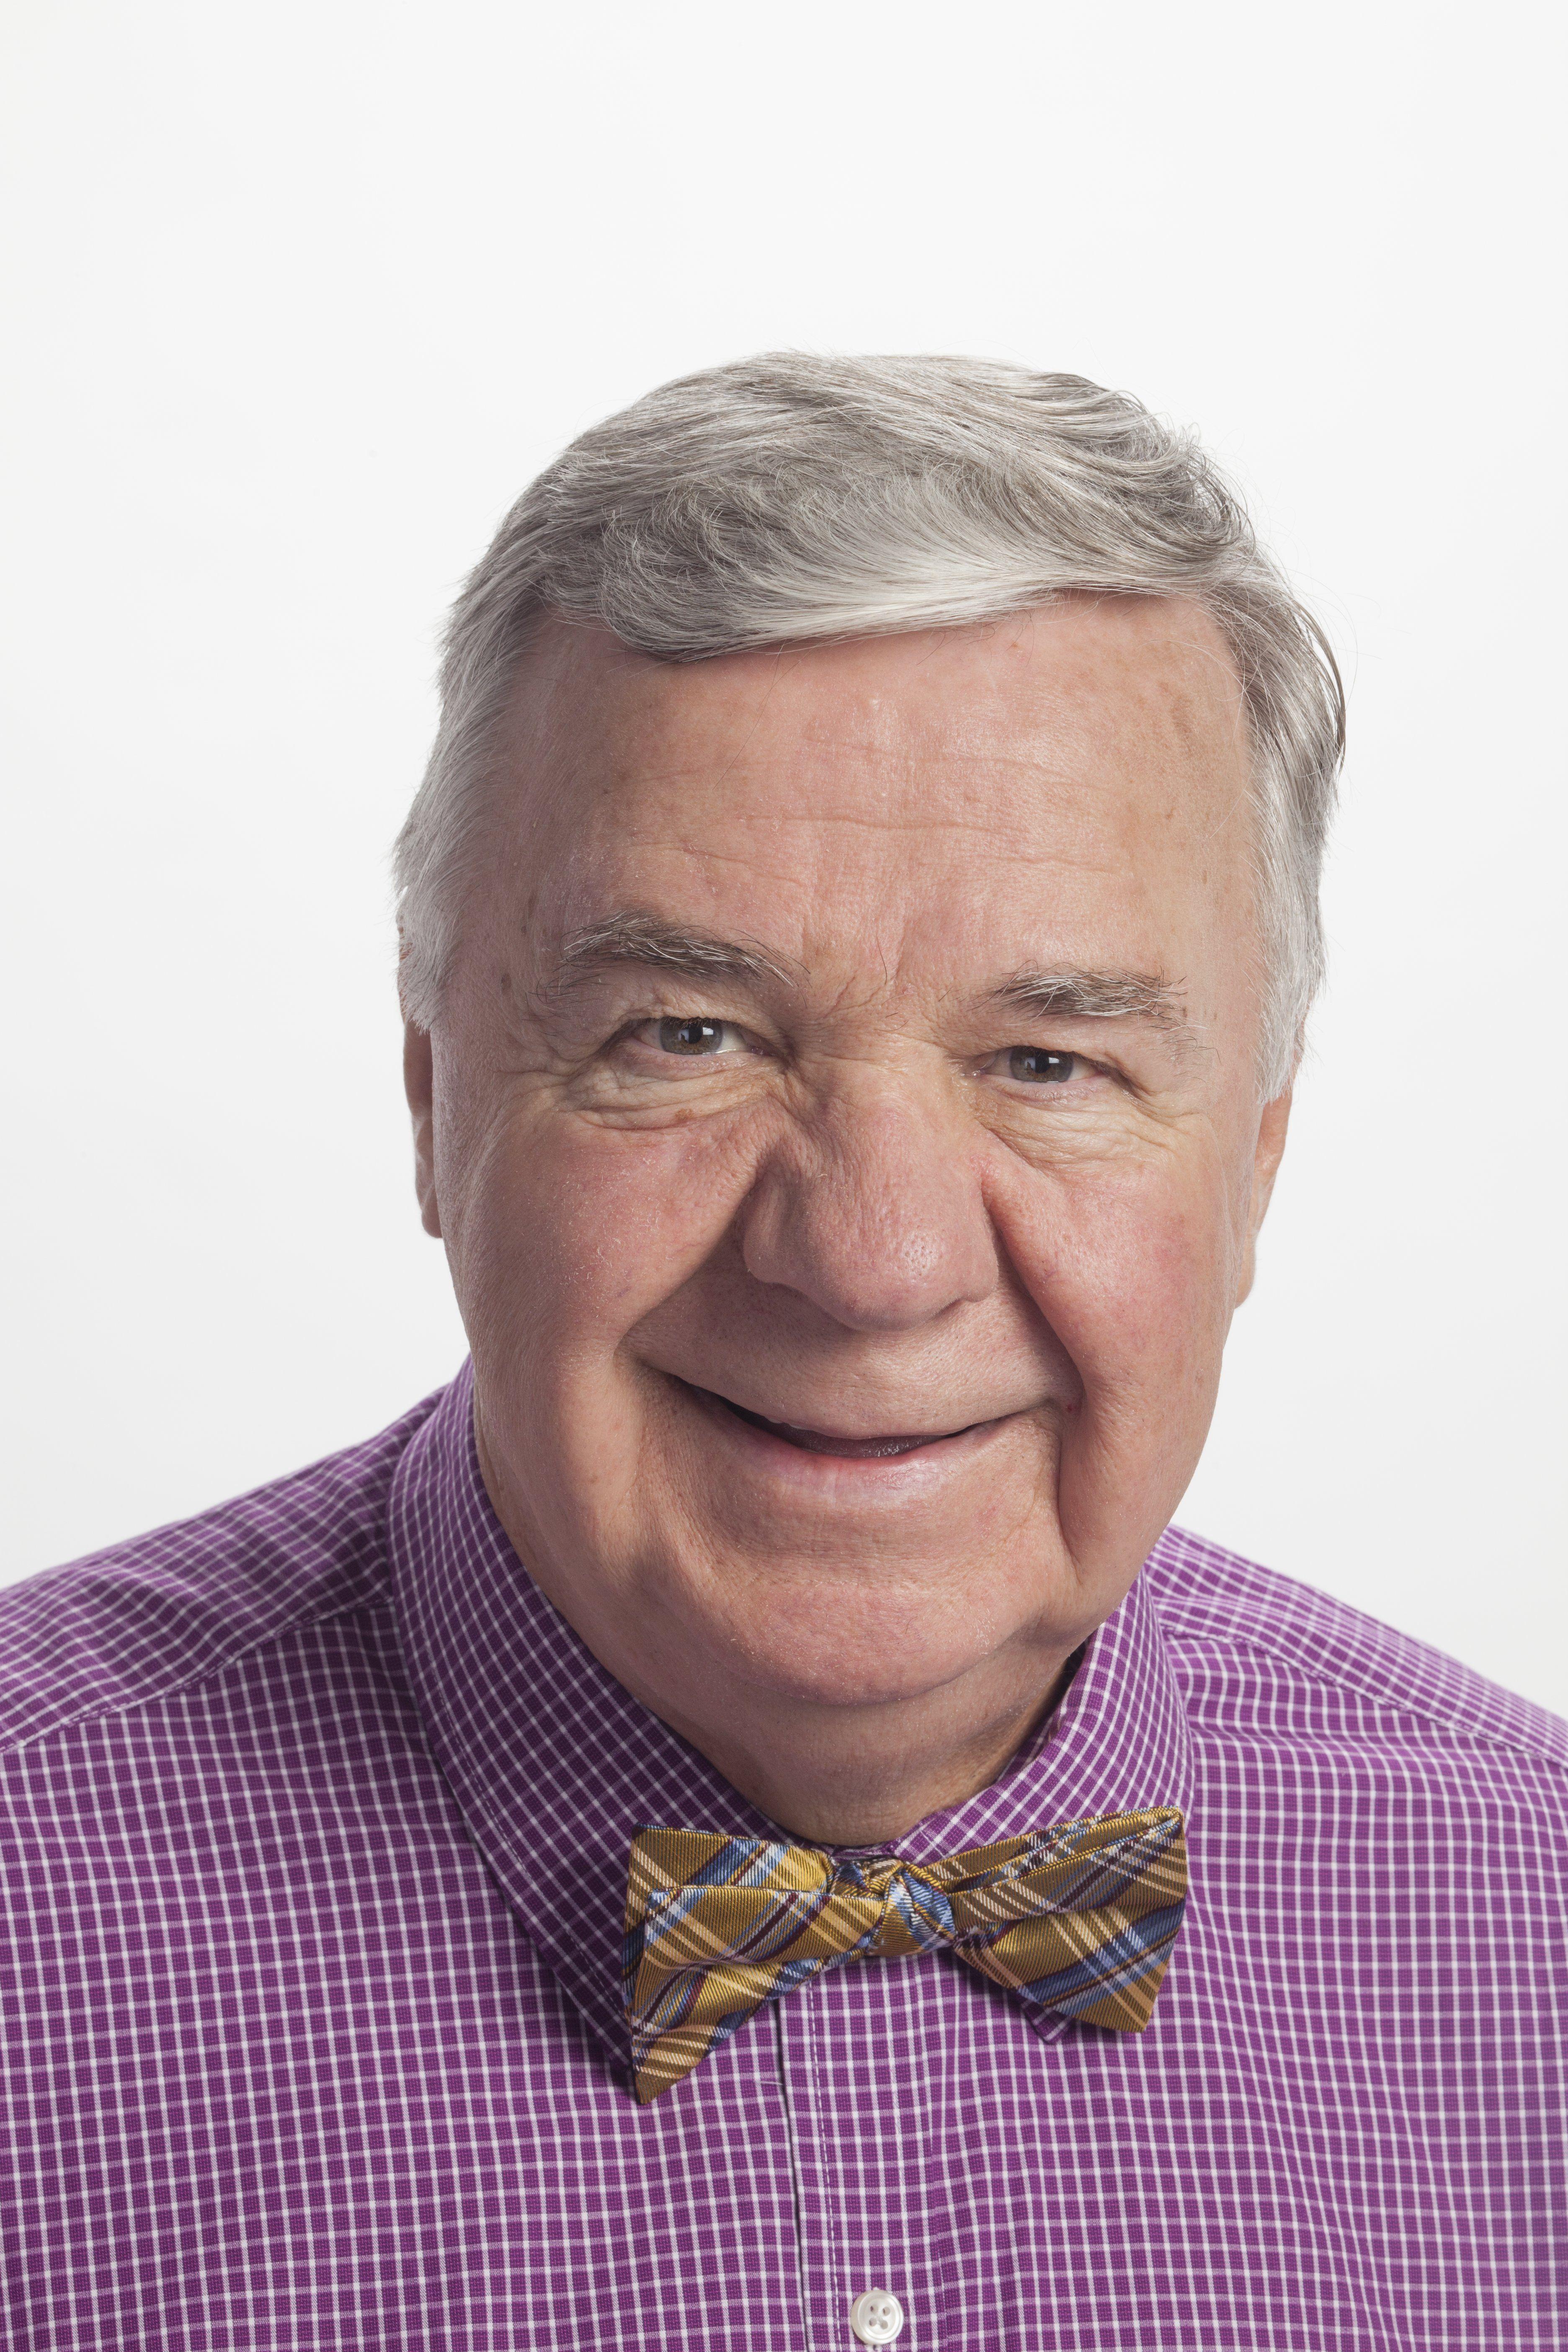 Donald L. Sheppard